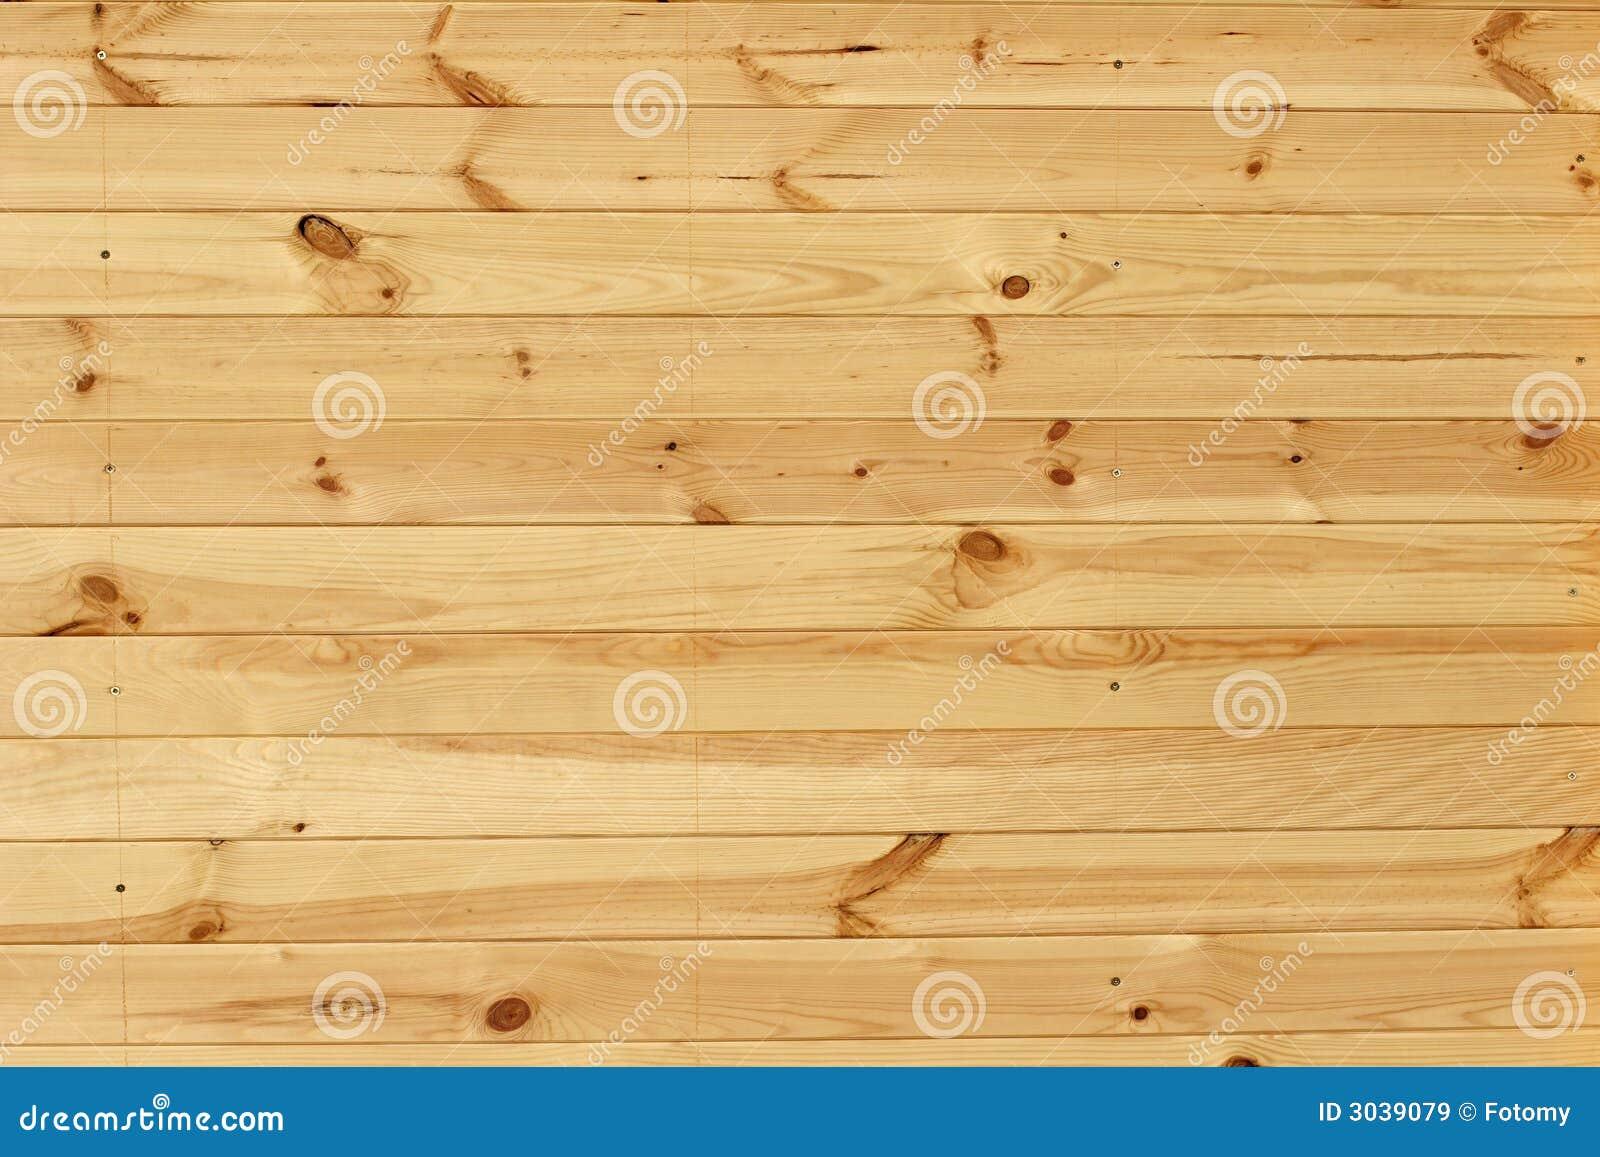 Wood planking from beach hut